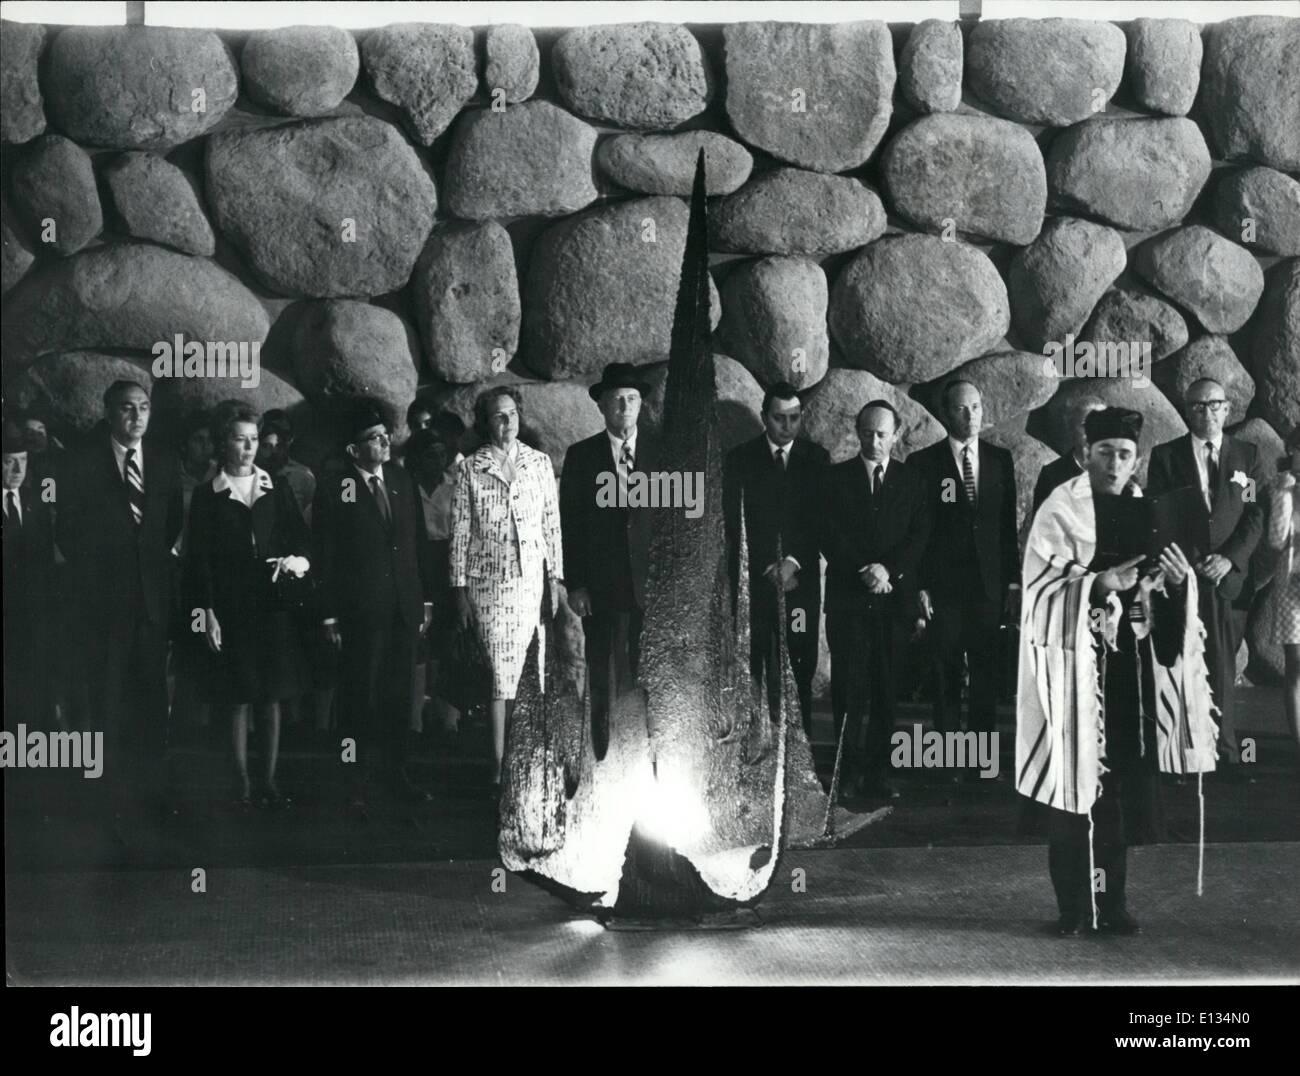 Feb. 26, 2012 - Mr. Rogers at Yad-Vashem: Photo shows U.S. Secretary of State Mr. William P. Rogers and his entourage on a short visit at Yad-Vashem in Jerusalem. - Stock Image